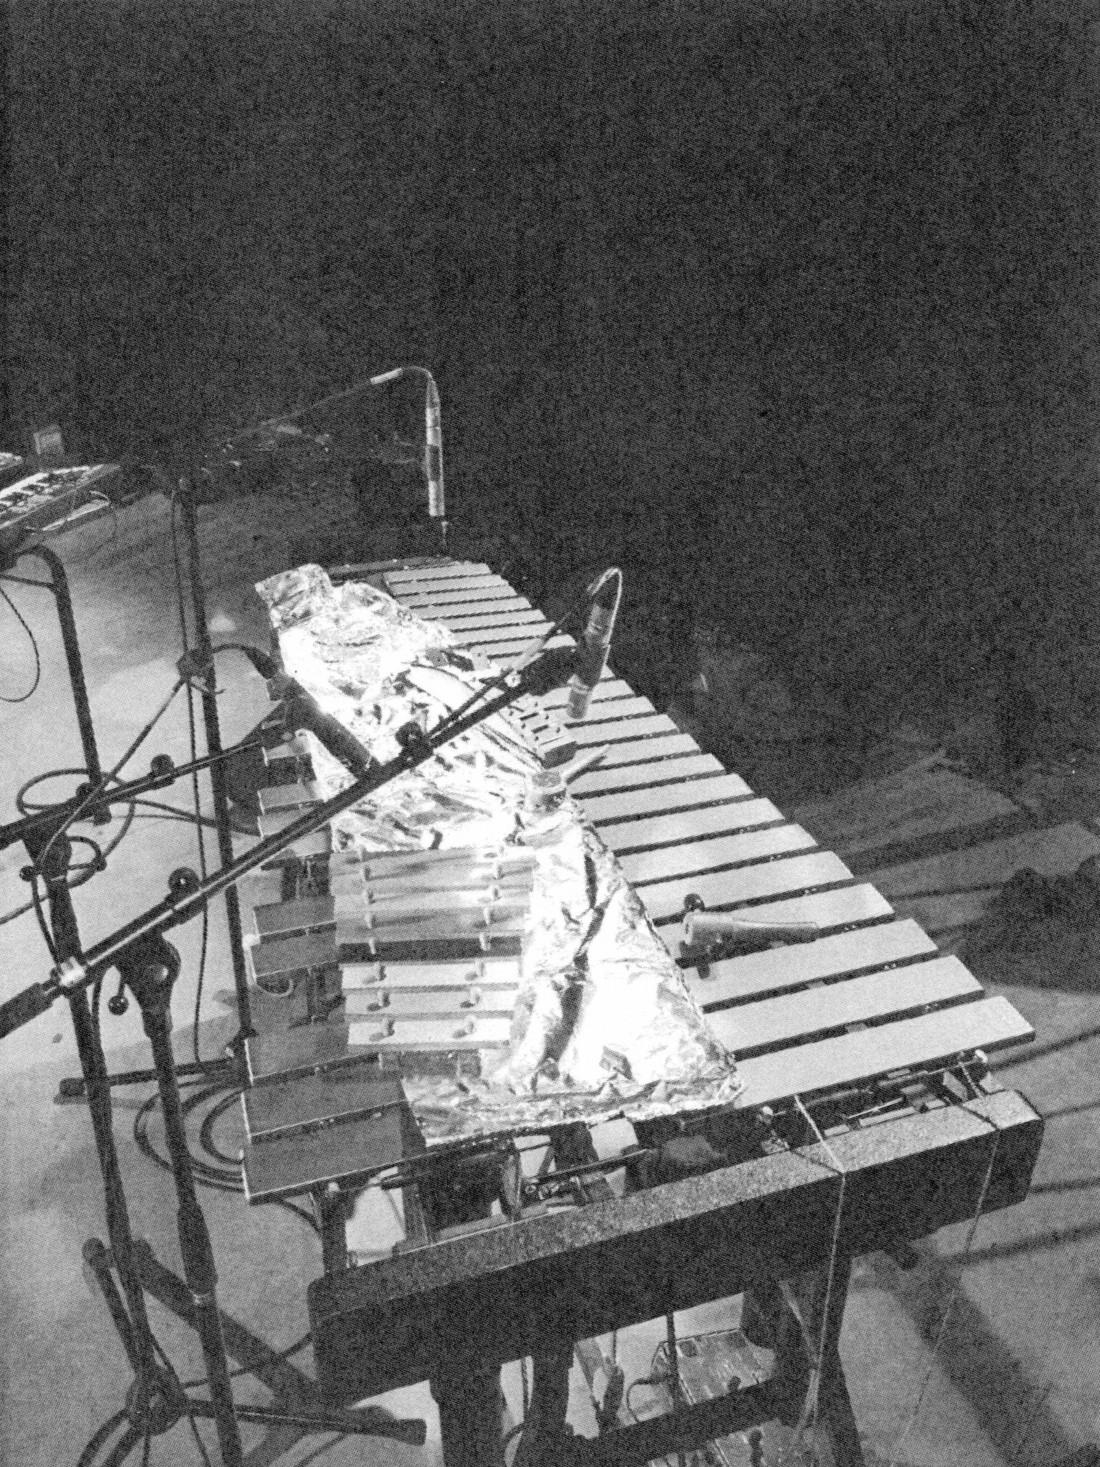 Equipment von Masayoshi Fujita.